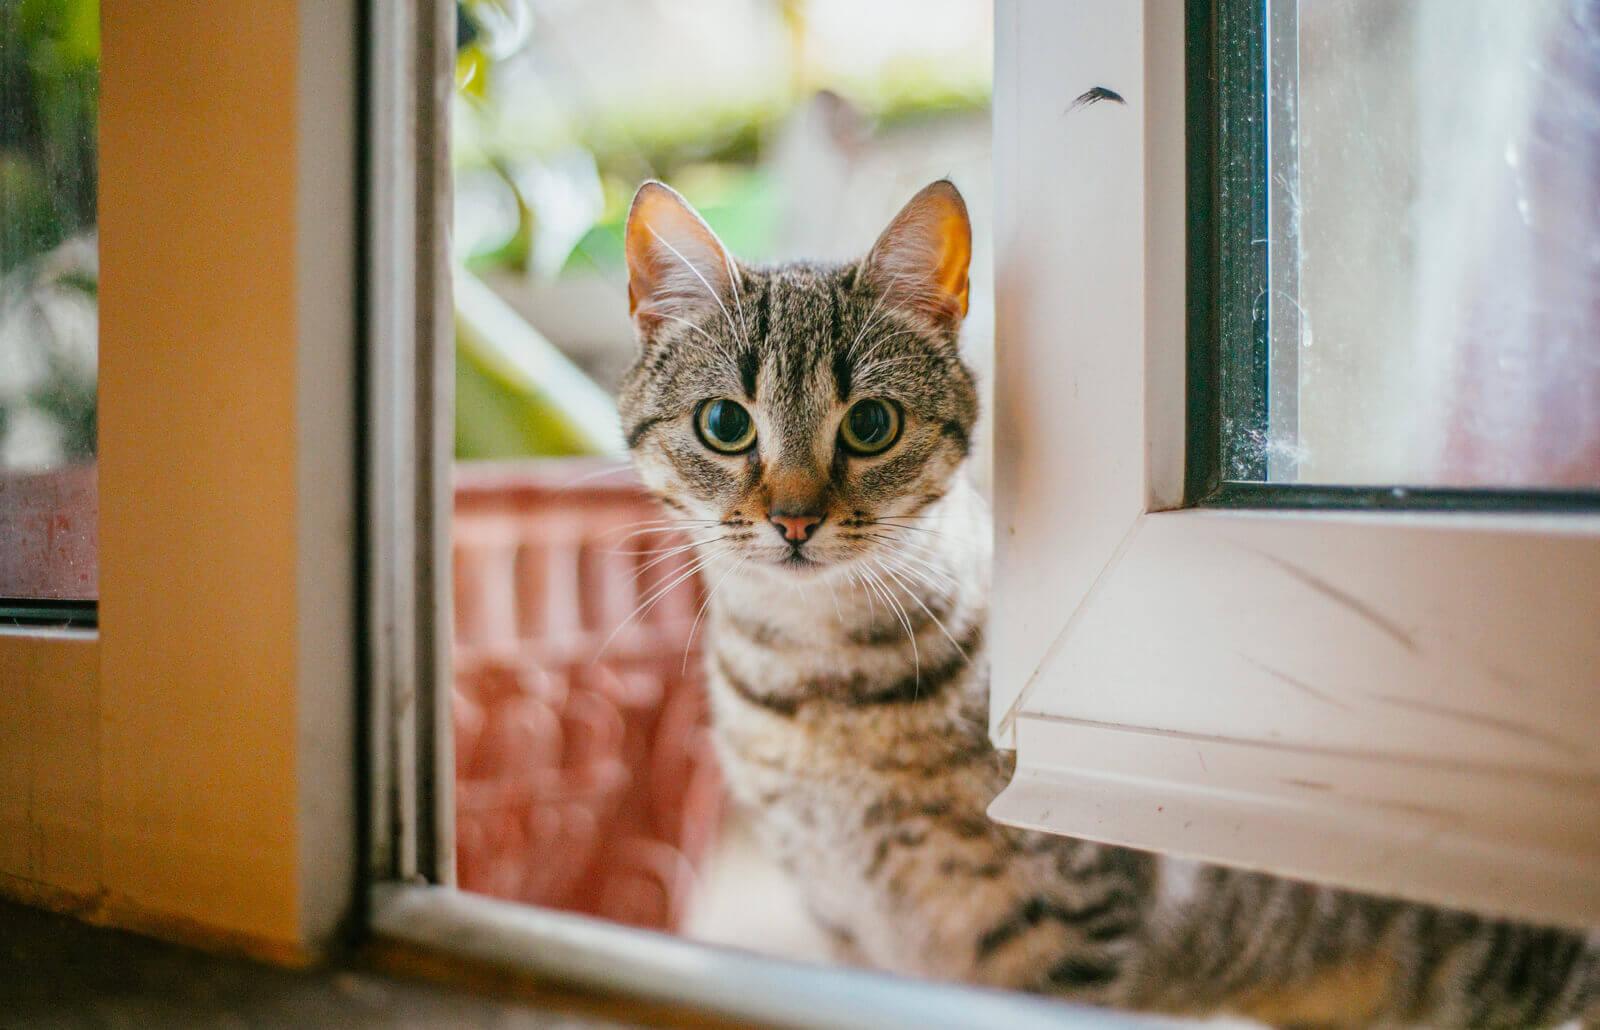 Penyebab Mengapa Kucing Kampung Sering Dihindari